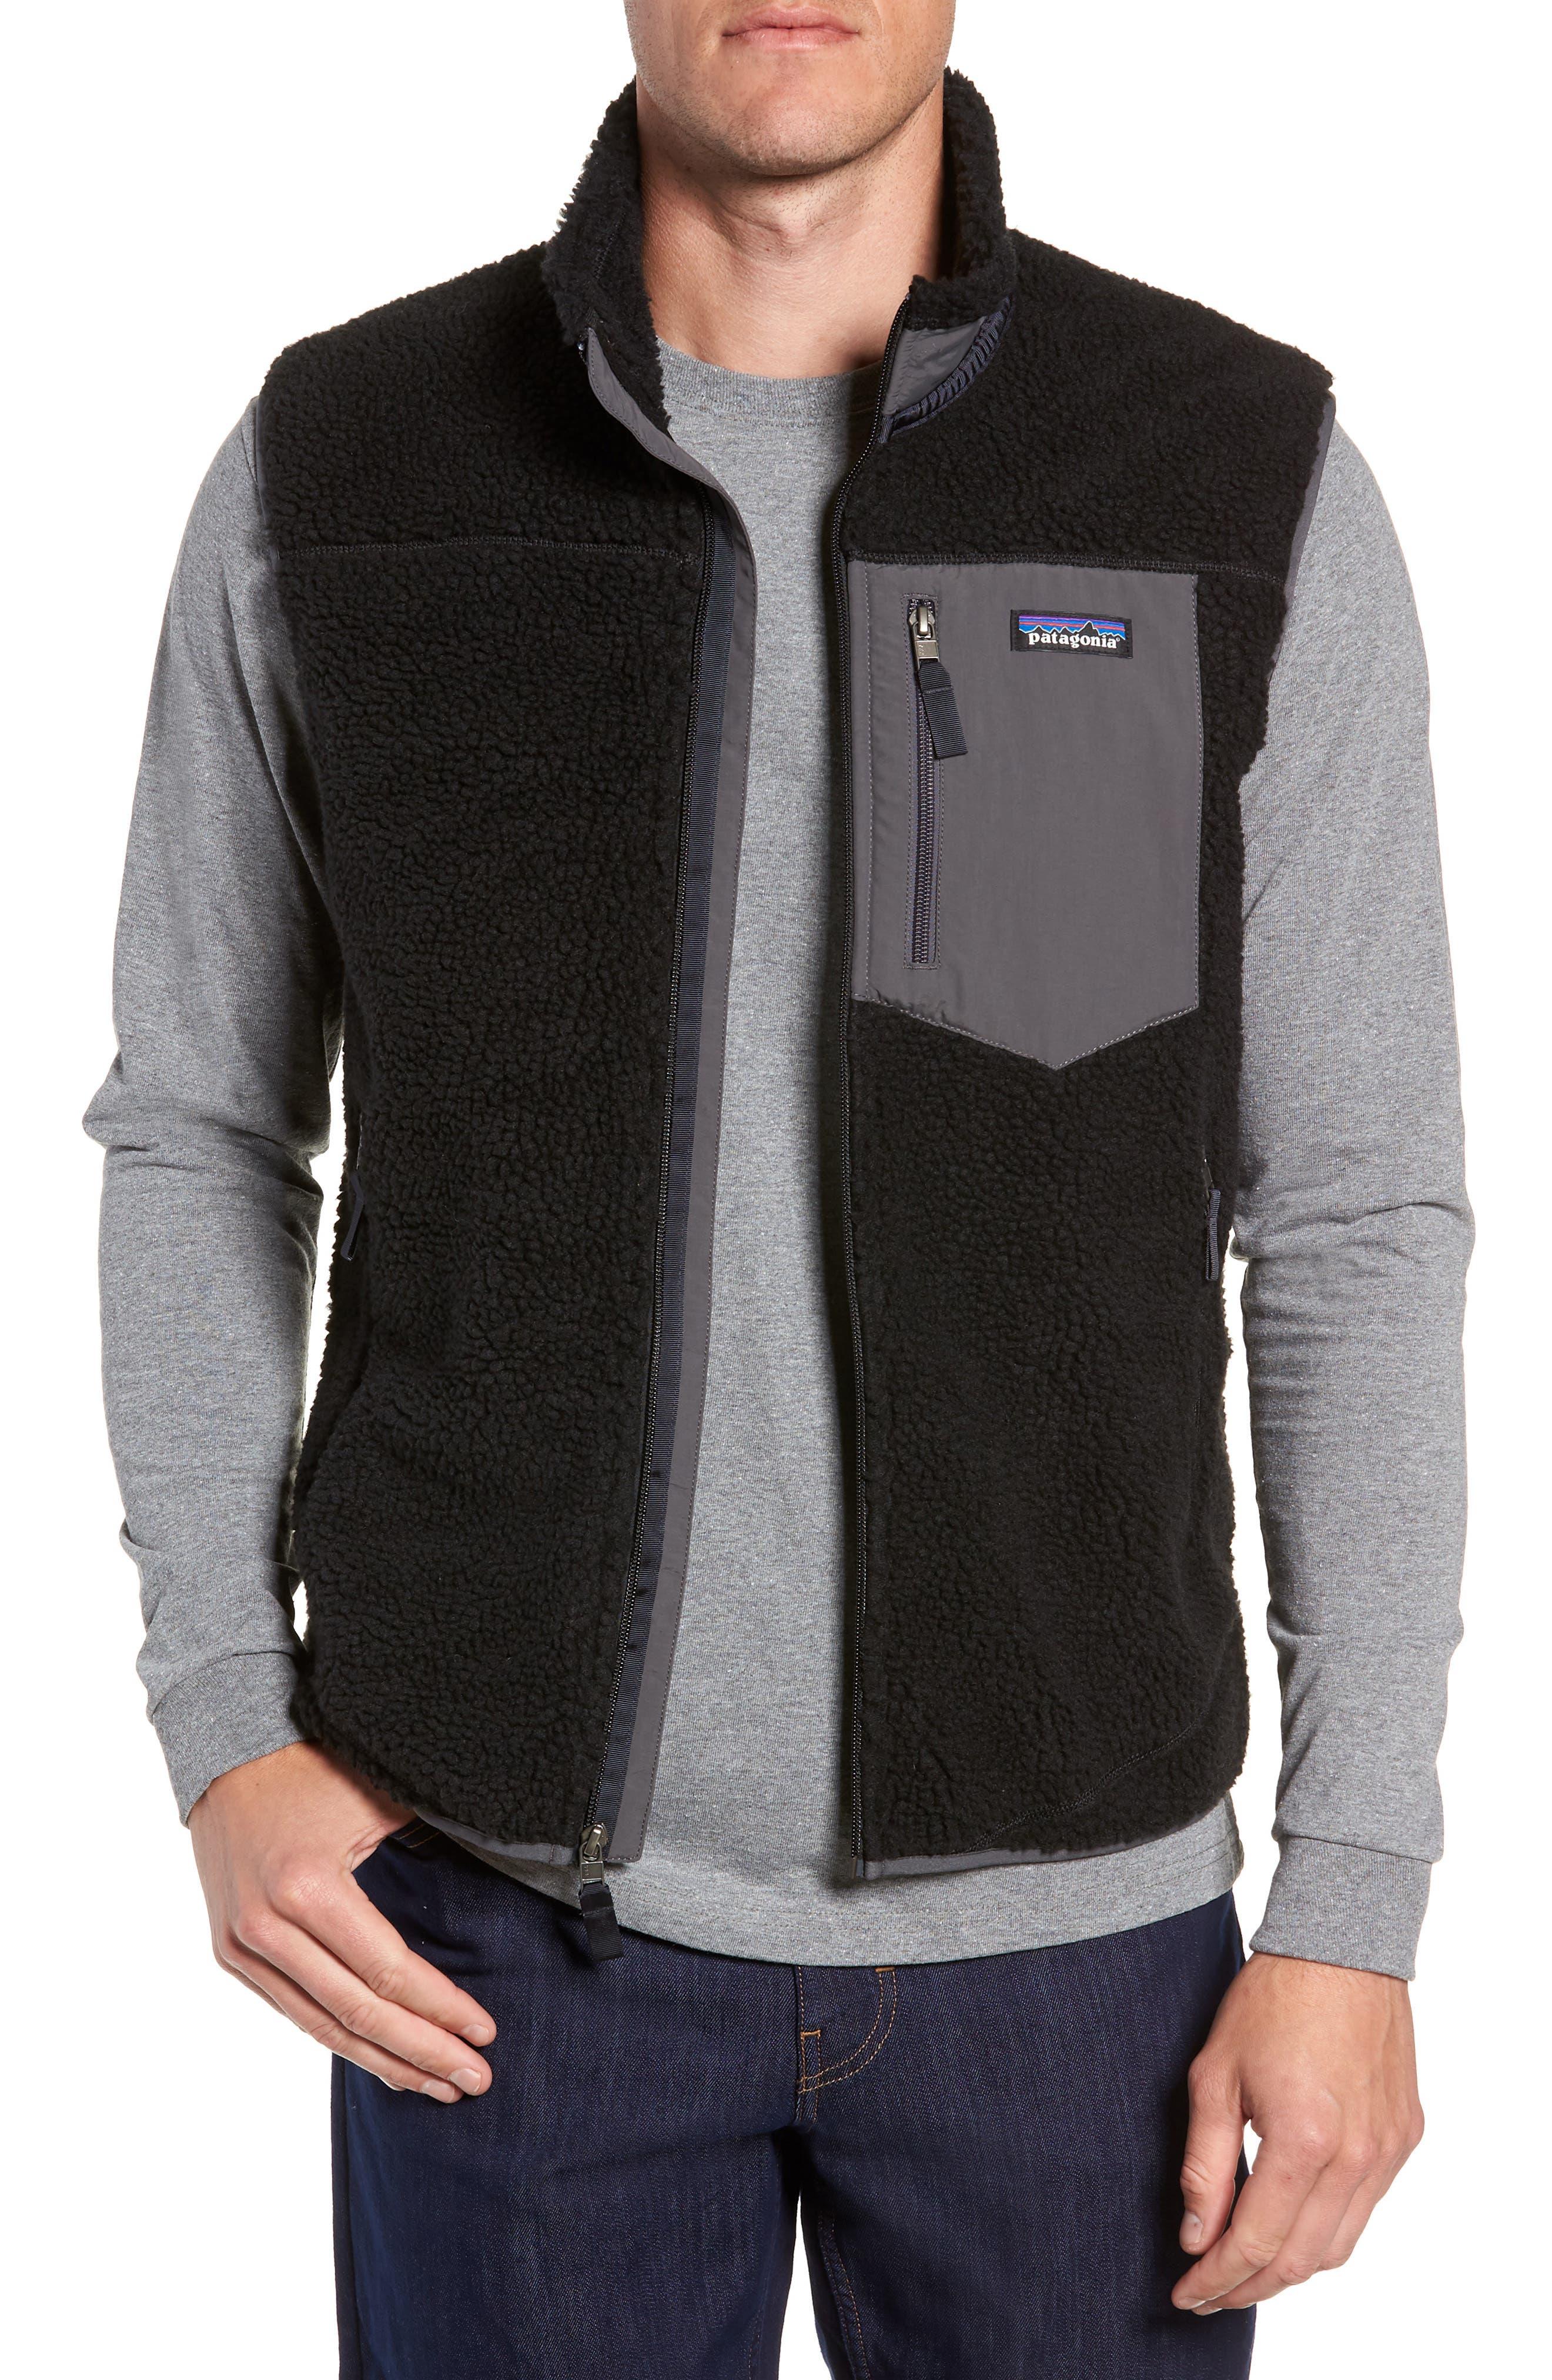 Classic Retro-X<sup>®</sup> Windproof Vest,                             Main thumbnail 1, color,                             002